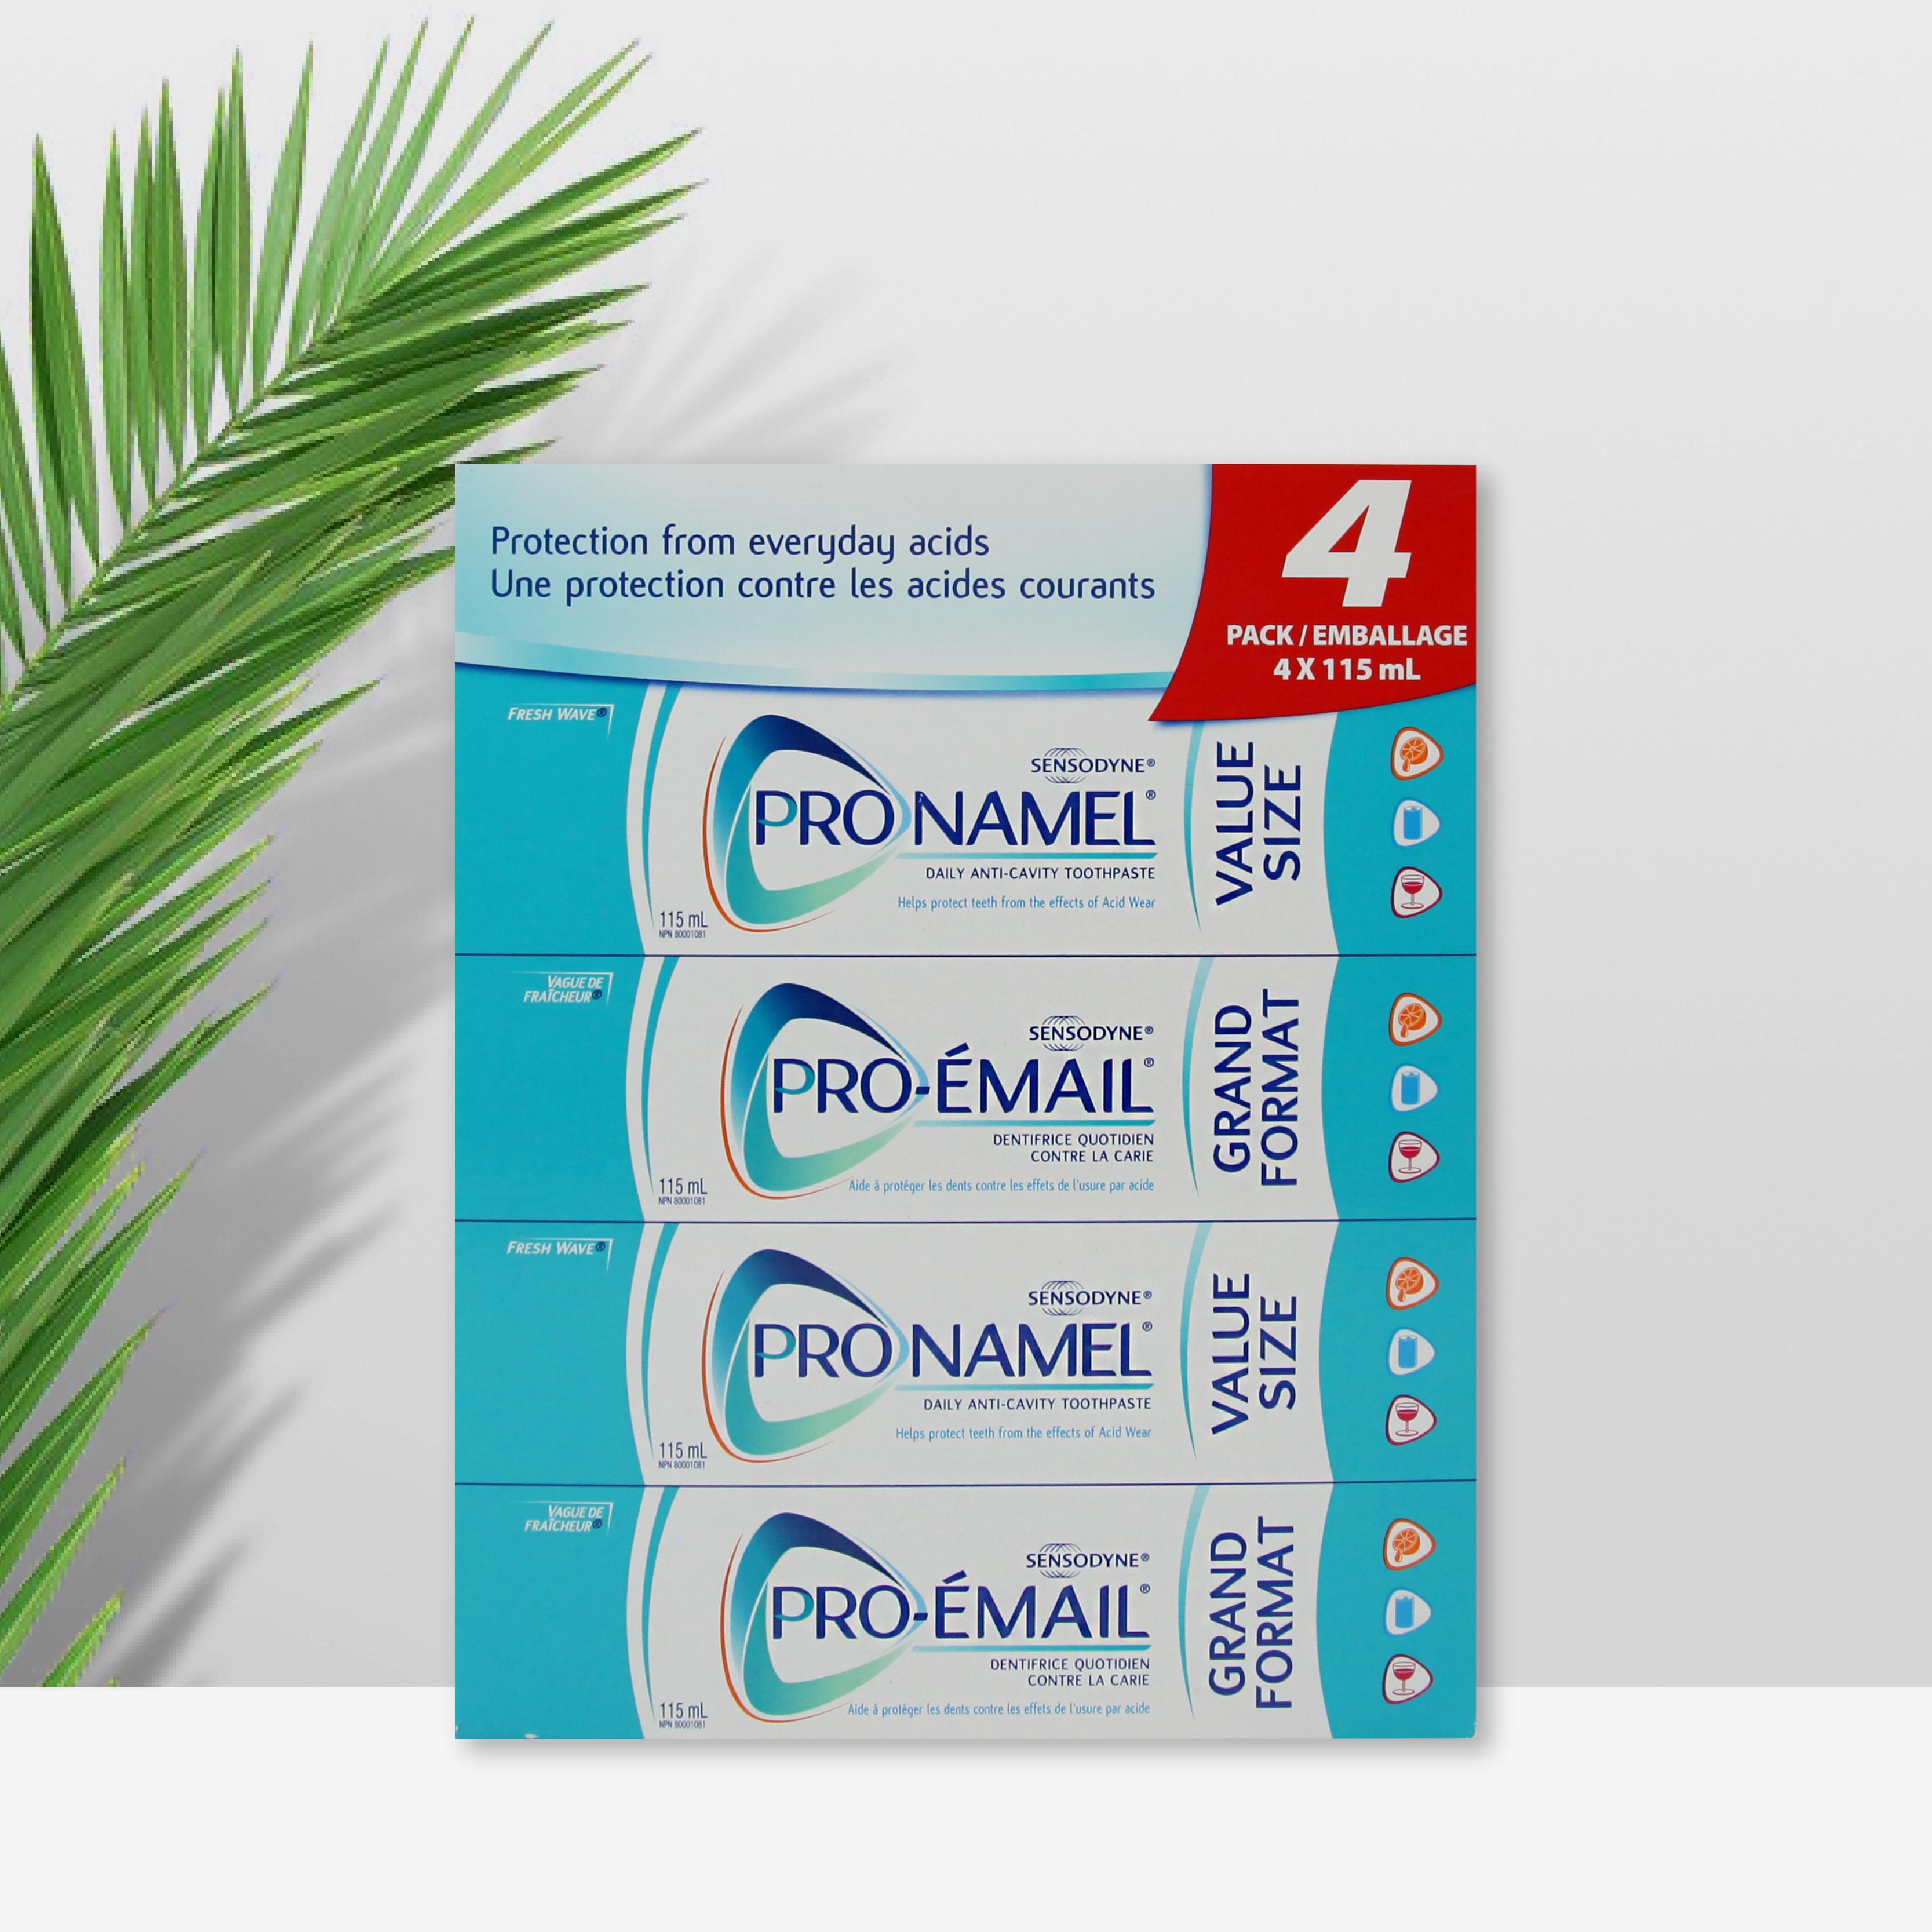 SENSODYNE舒适达牙膏含氟防酸腐蚀115ml*4超值4支装